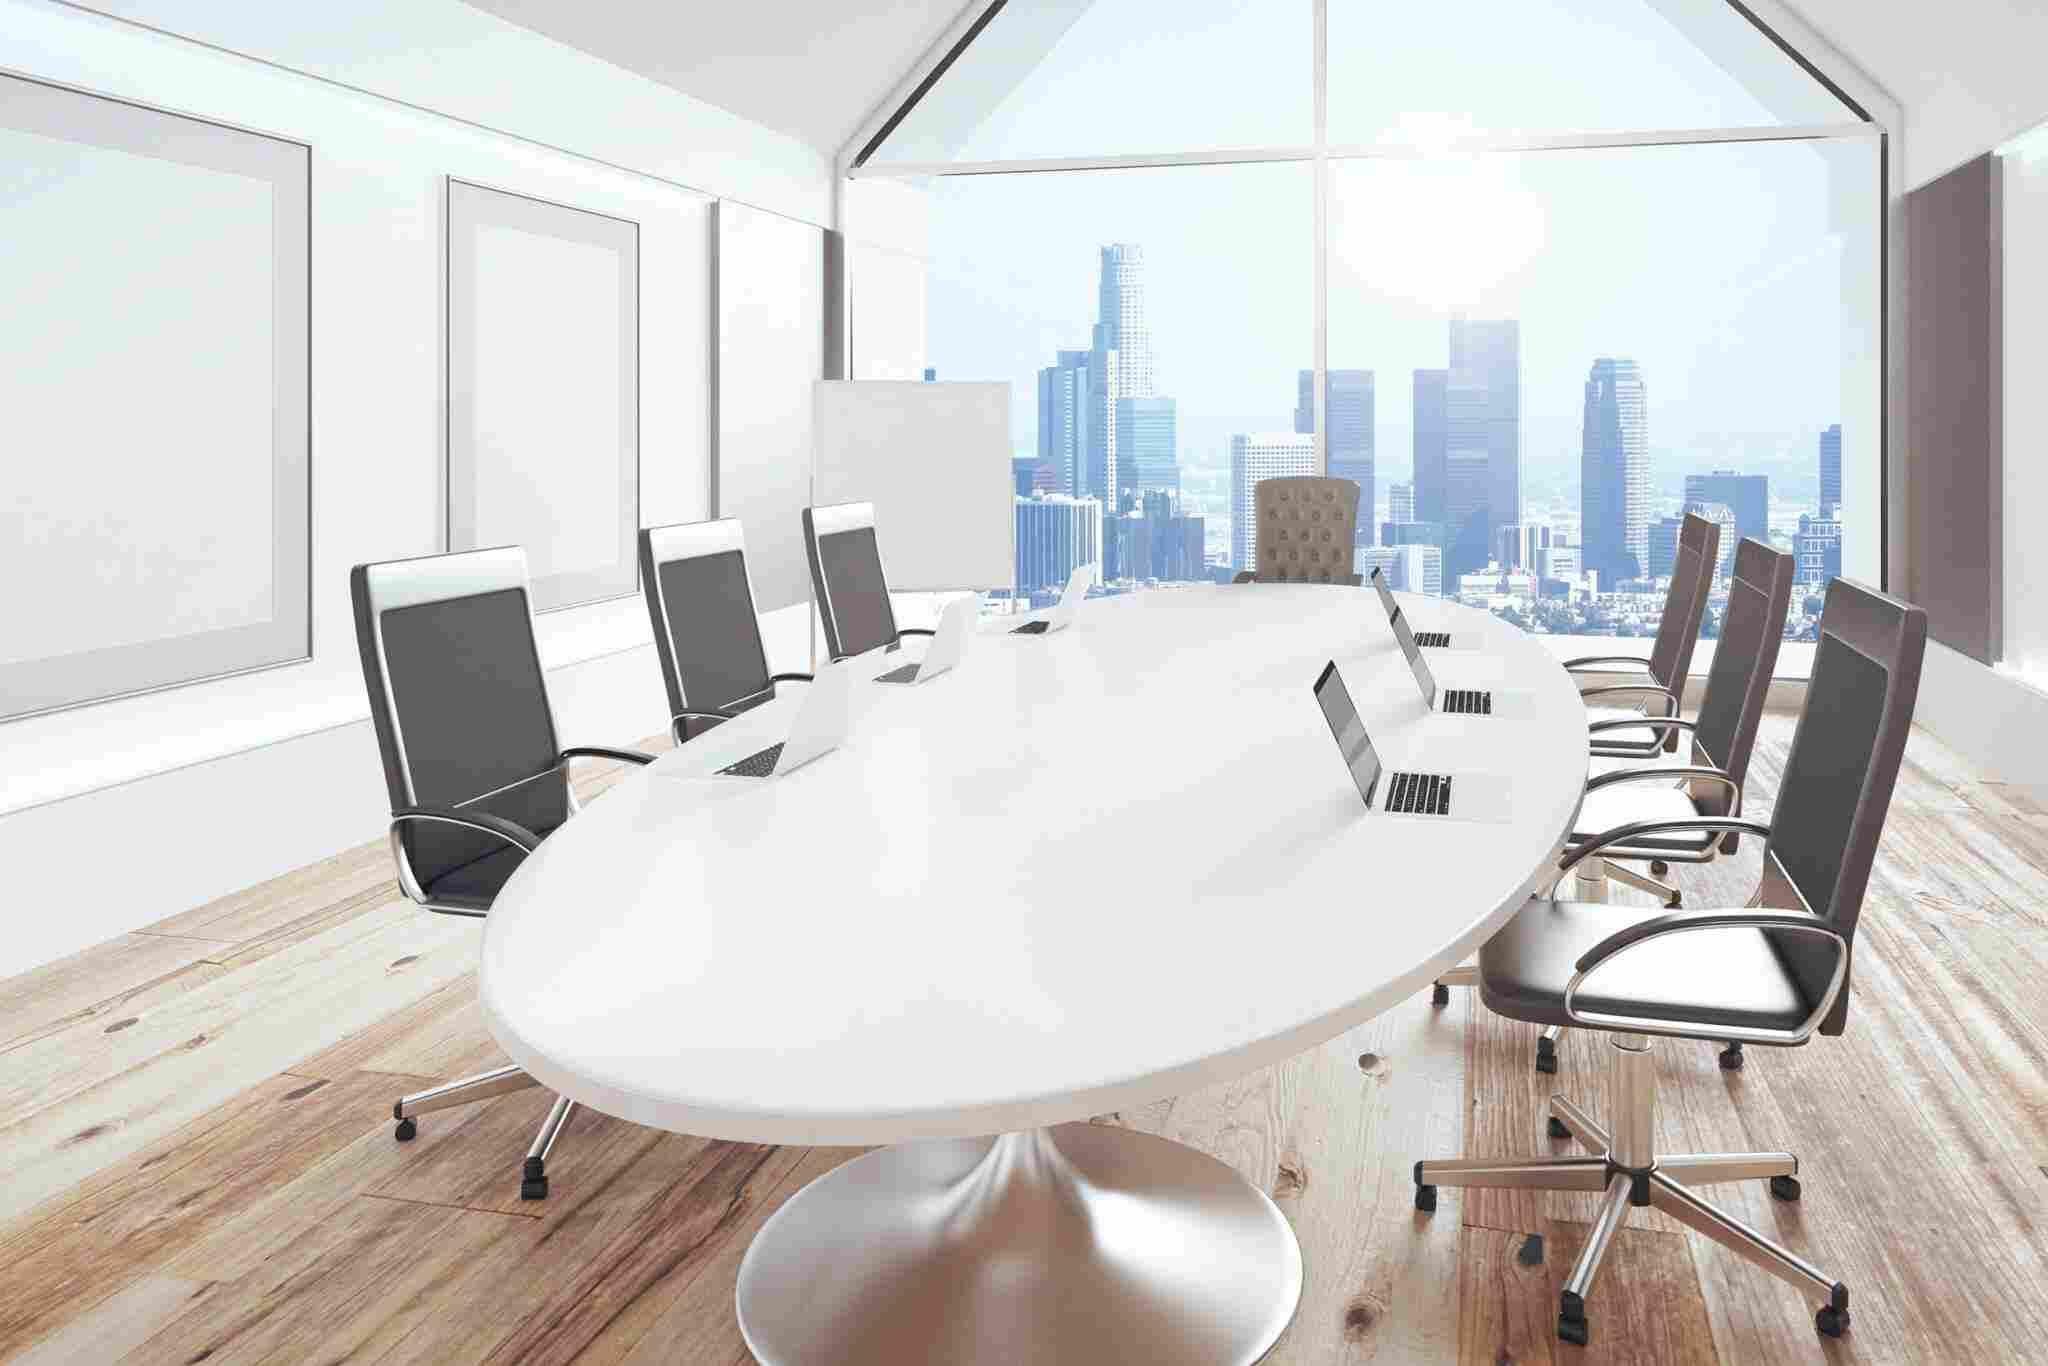 https://manchandainteriors.com/wp-content/uploads/2017/05/image-office-chairs.jpg